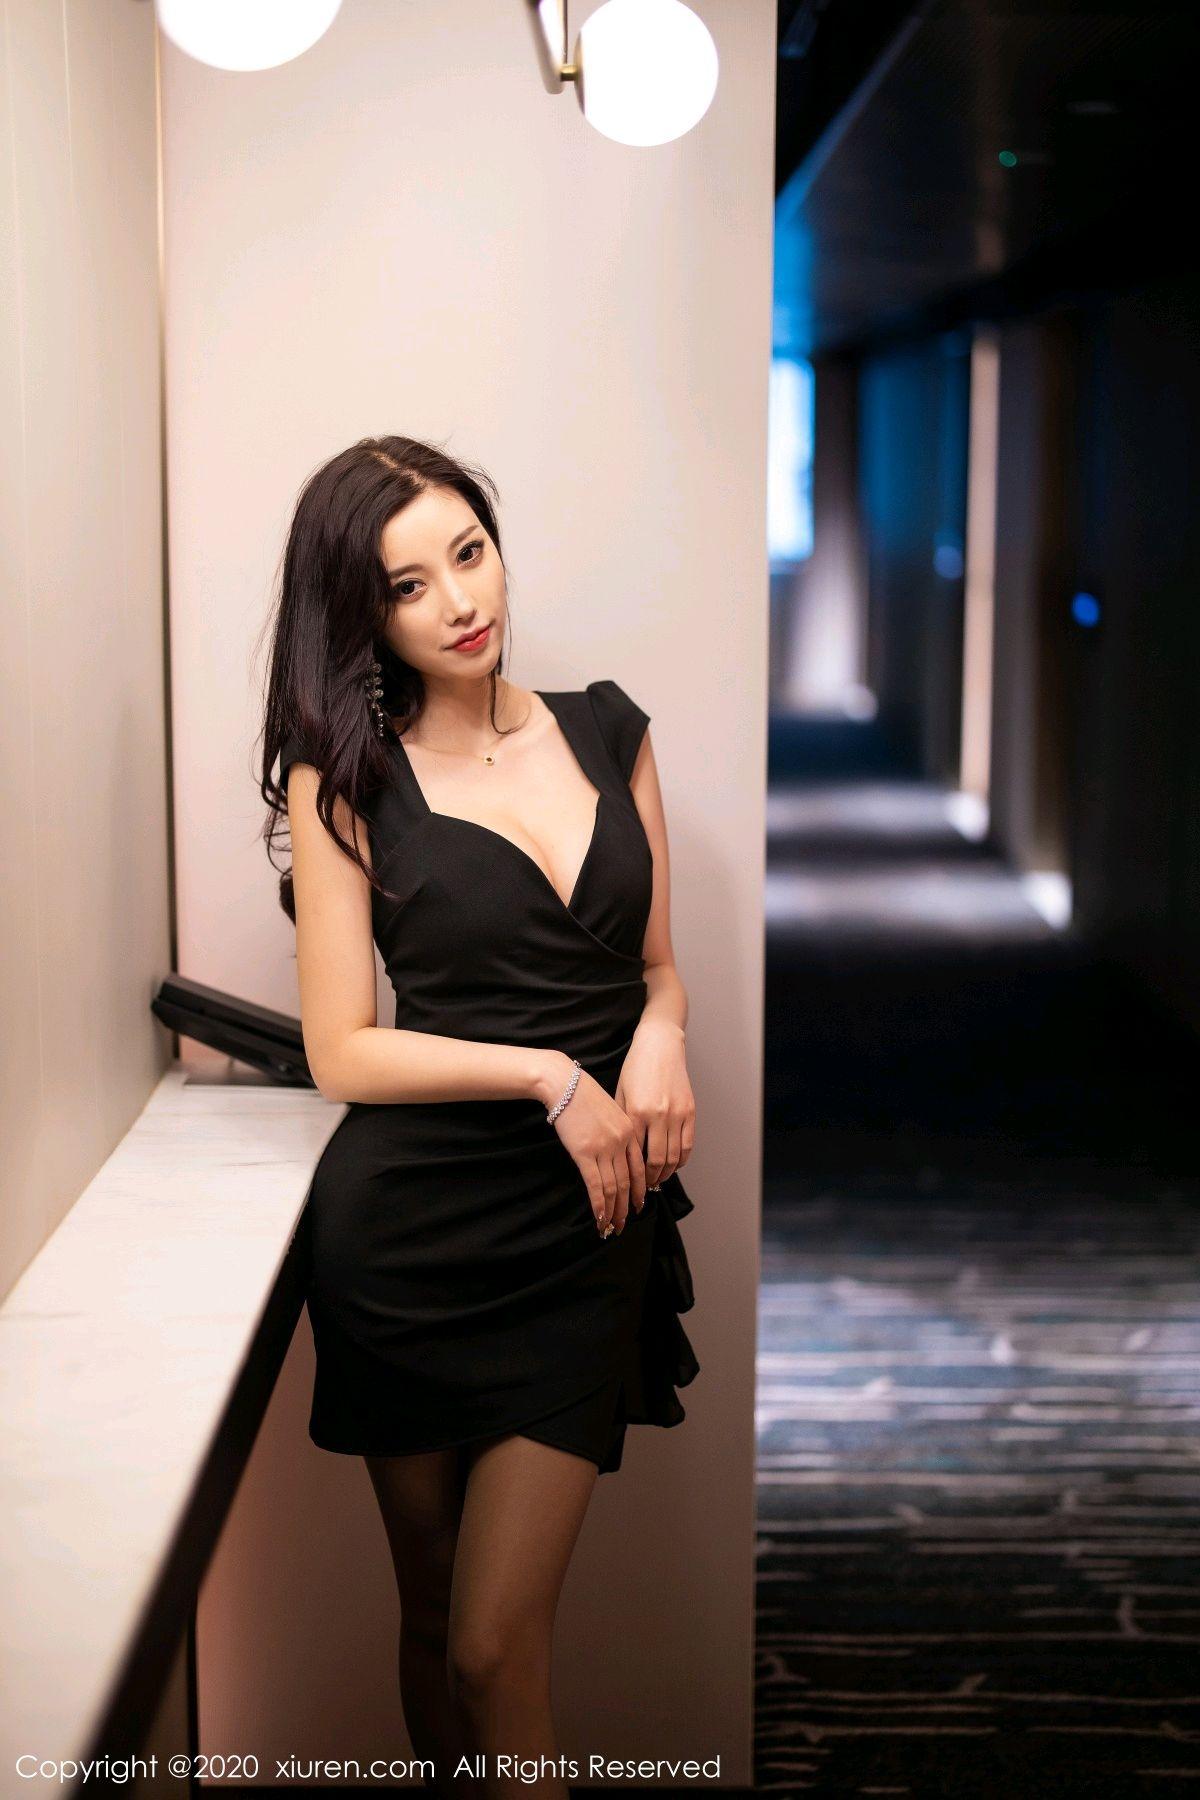 [XiuRen] Vol.2241 Yang Chen Chen 48P, Underwear, Xiuren, Yang Chen Chen